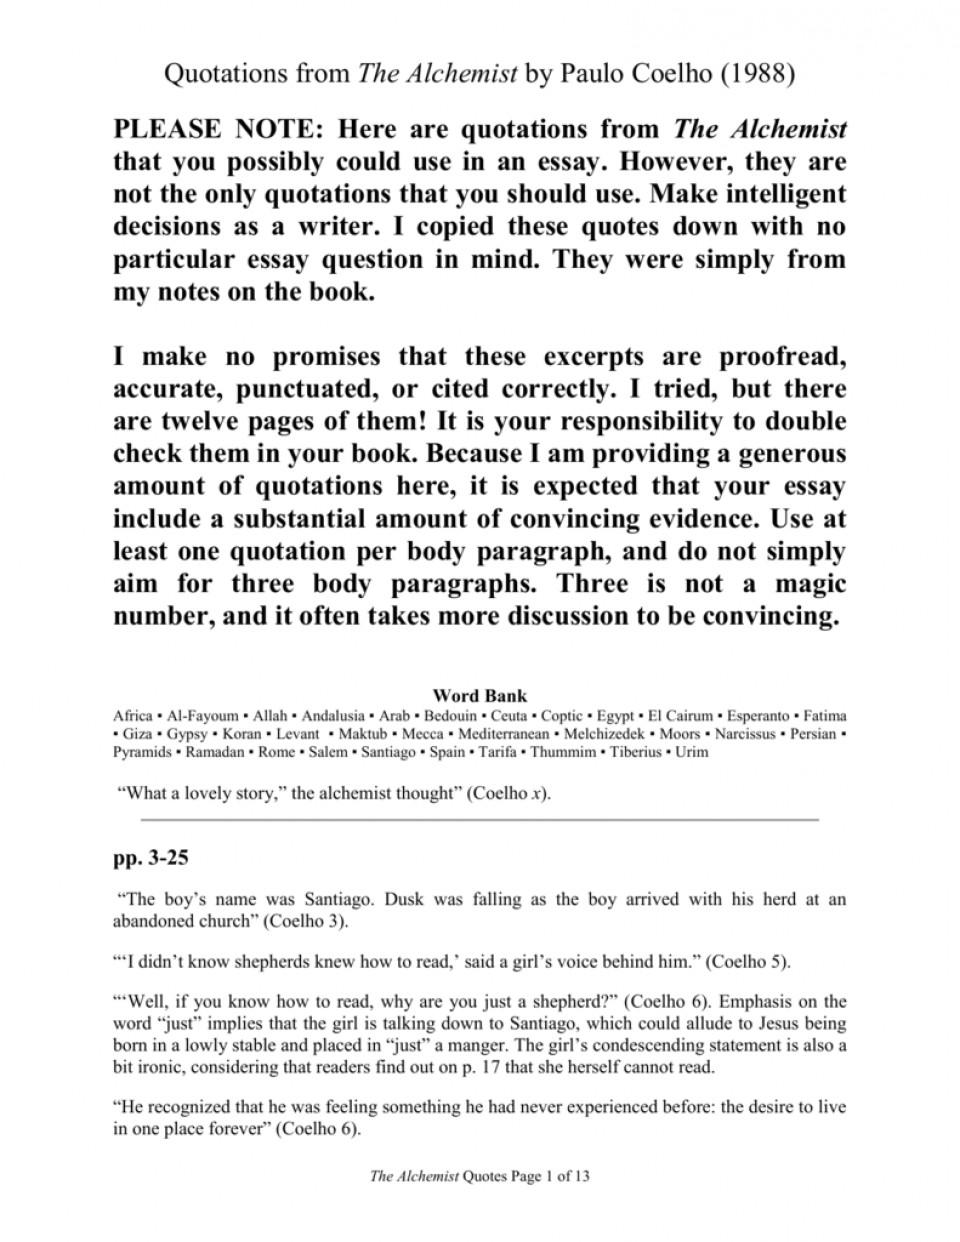 003 006831781 1 Essay Example The Remarkable Alchemist Ben Jonson Questions Outline Thesis 960